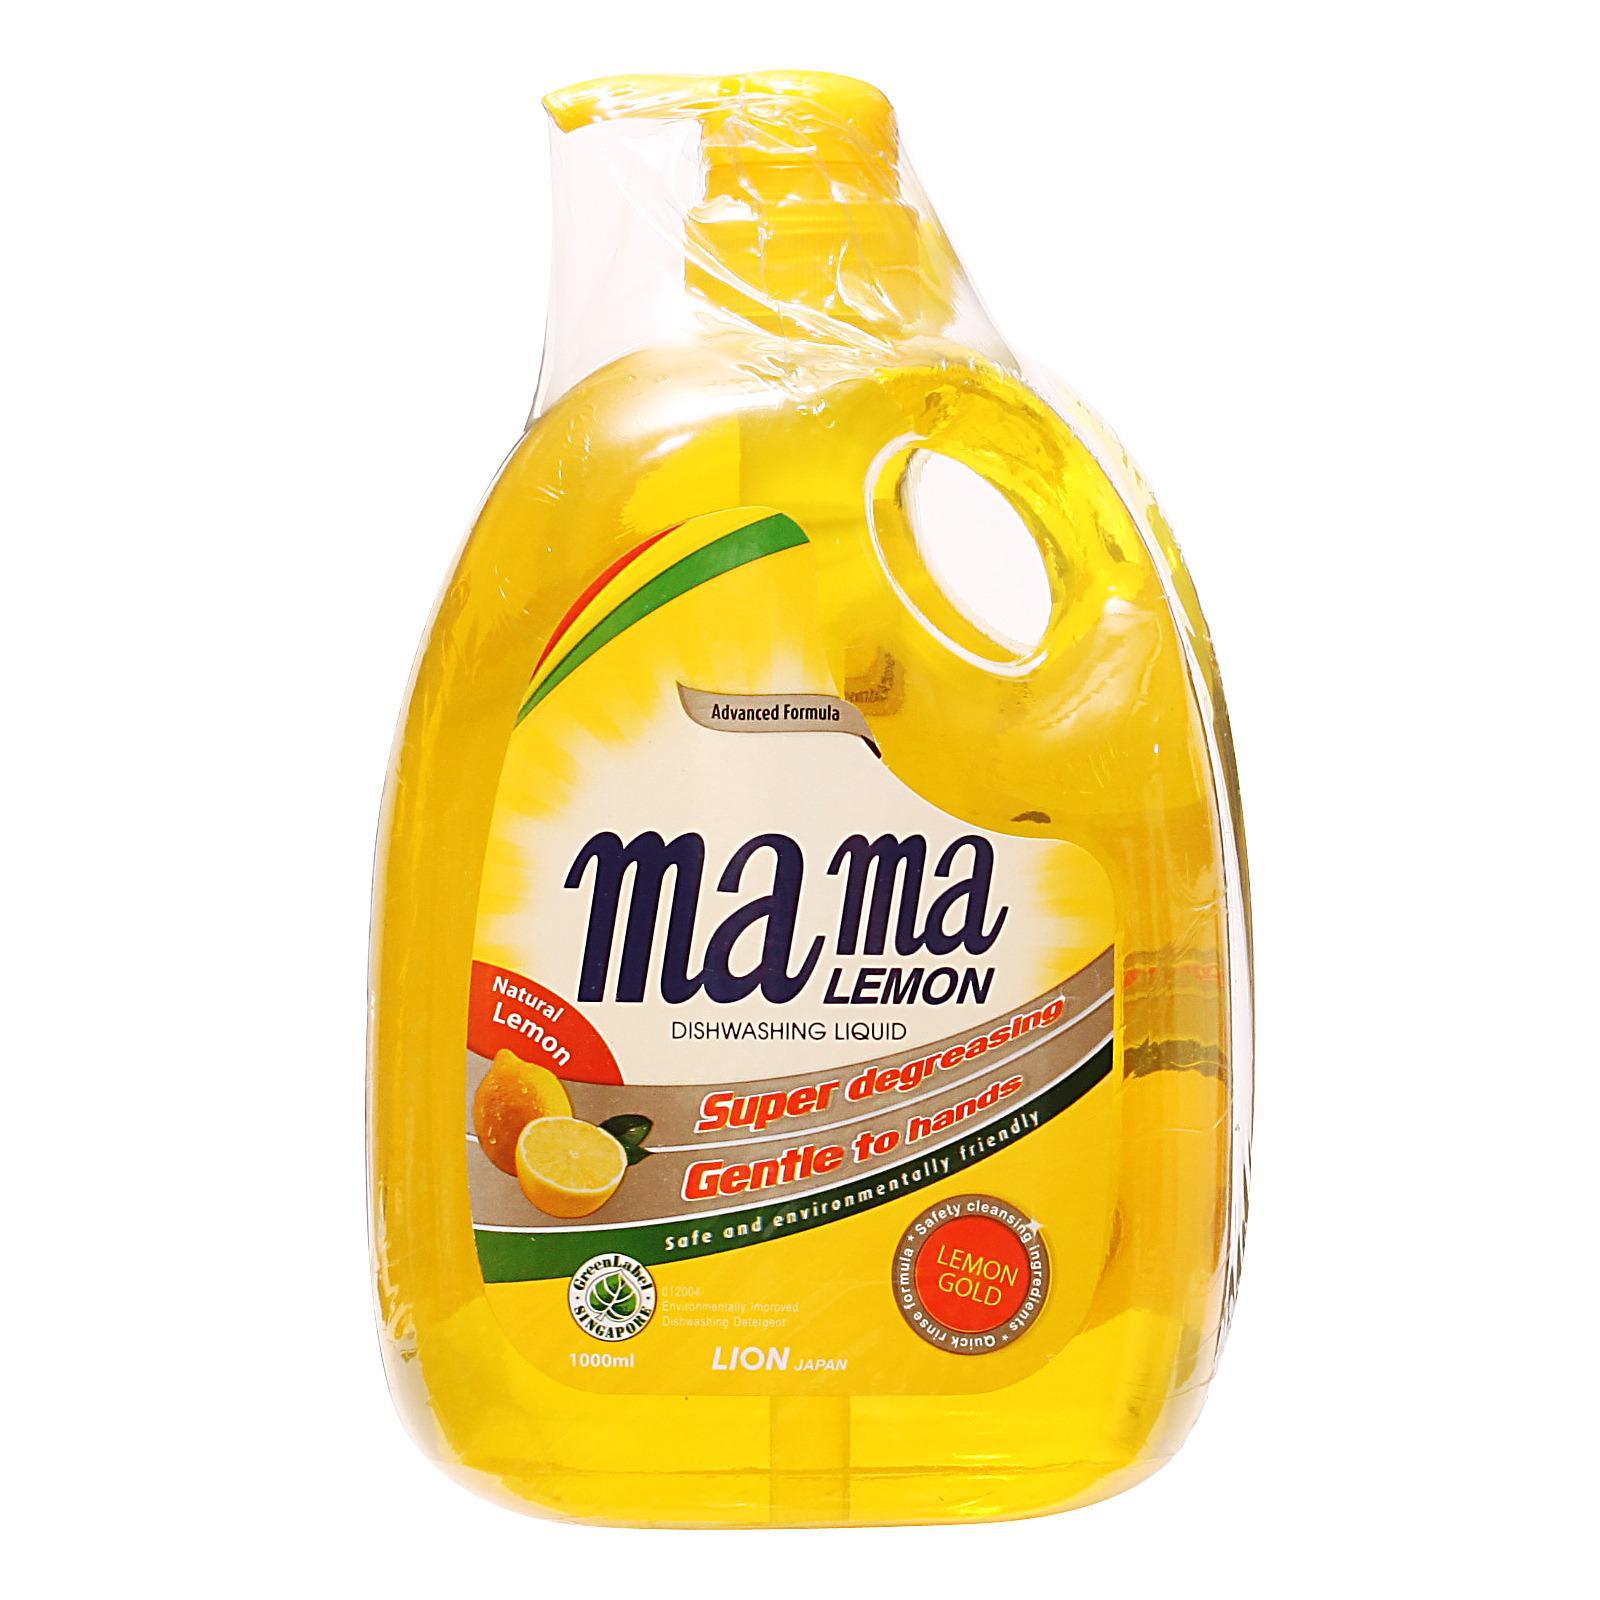 MAMA LEMON Dishwashing Liquid Lemon Gold +Refill 1L